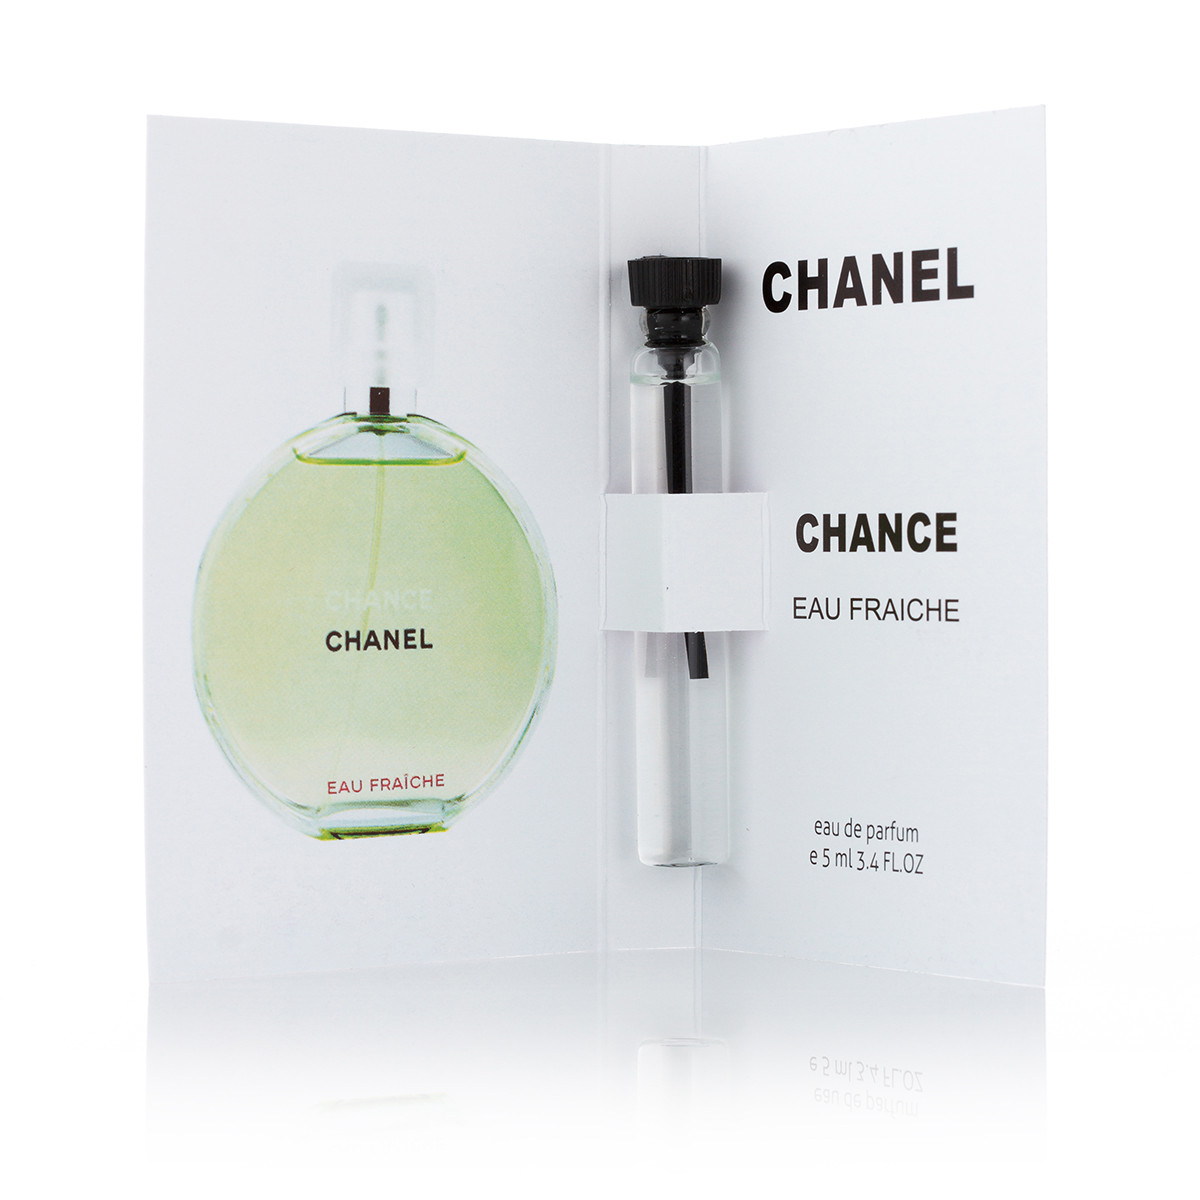 Женский парфюм Chanel Chance Eeau fraiche пробник 5 ml (реплика)